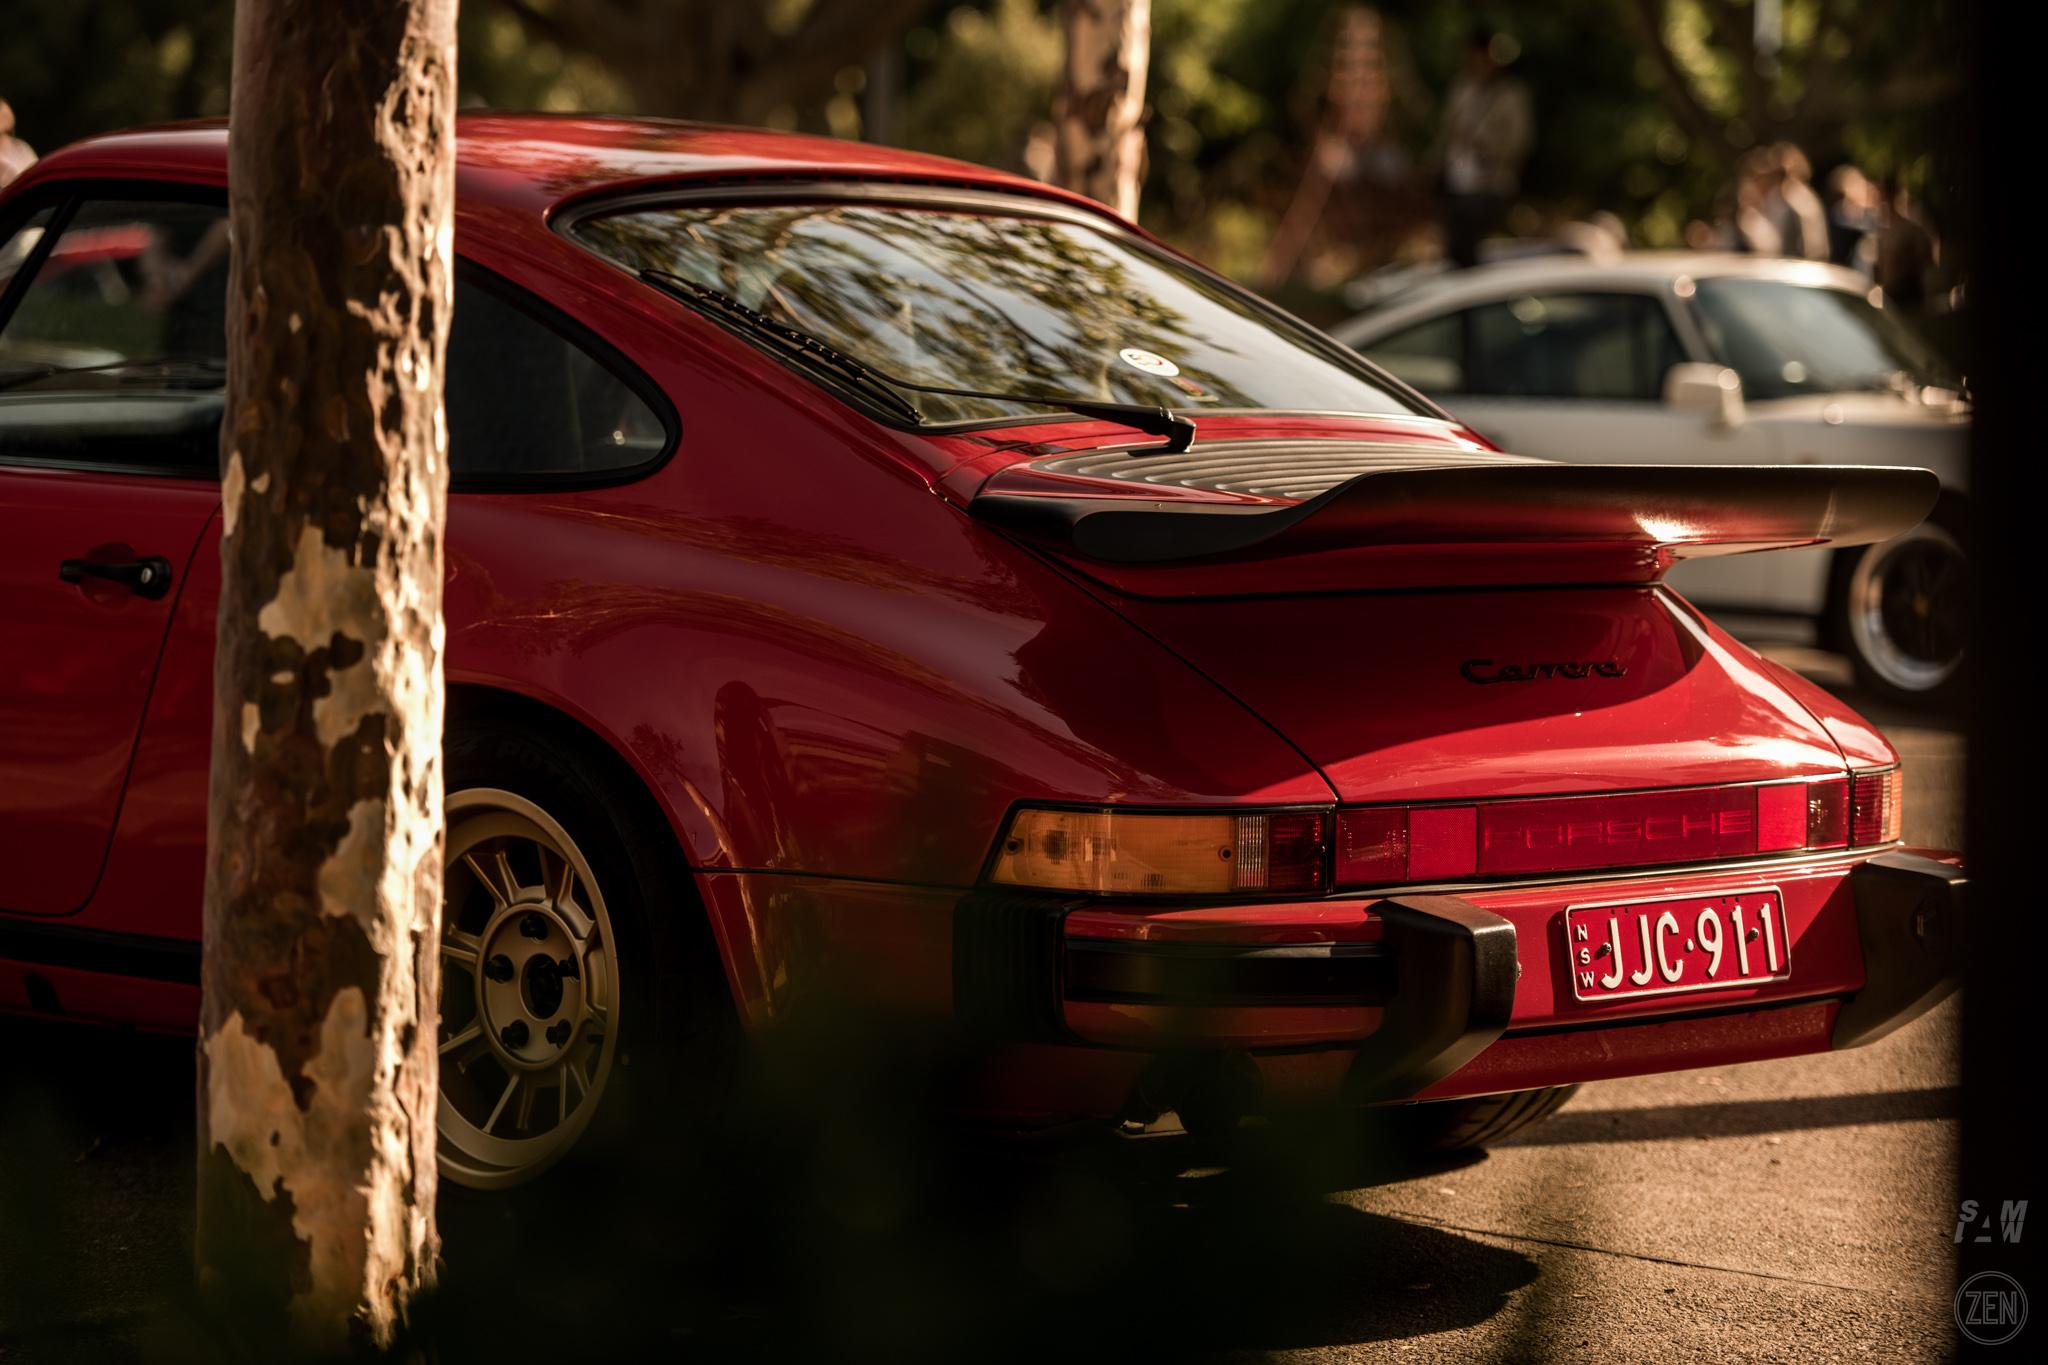 2019-10-27 - Autohaus Porsches & Coffee 128